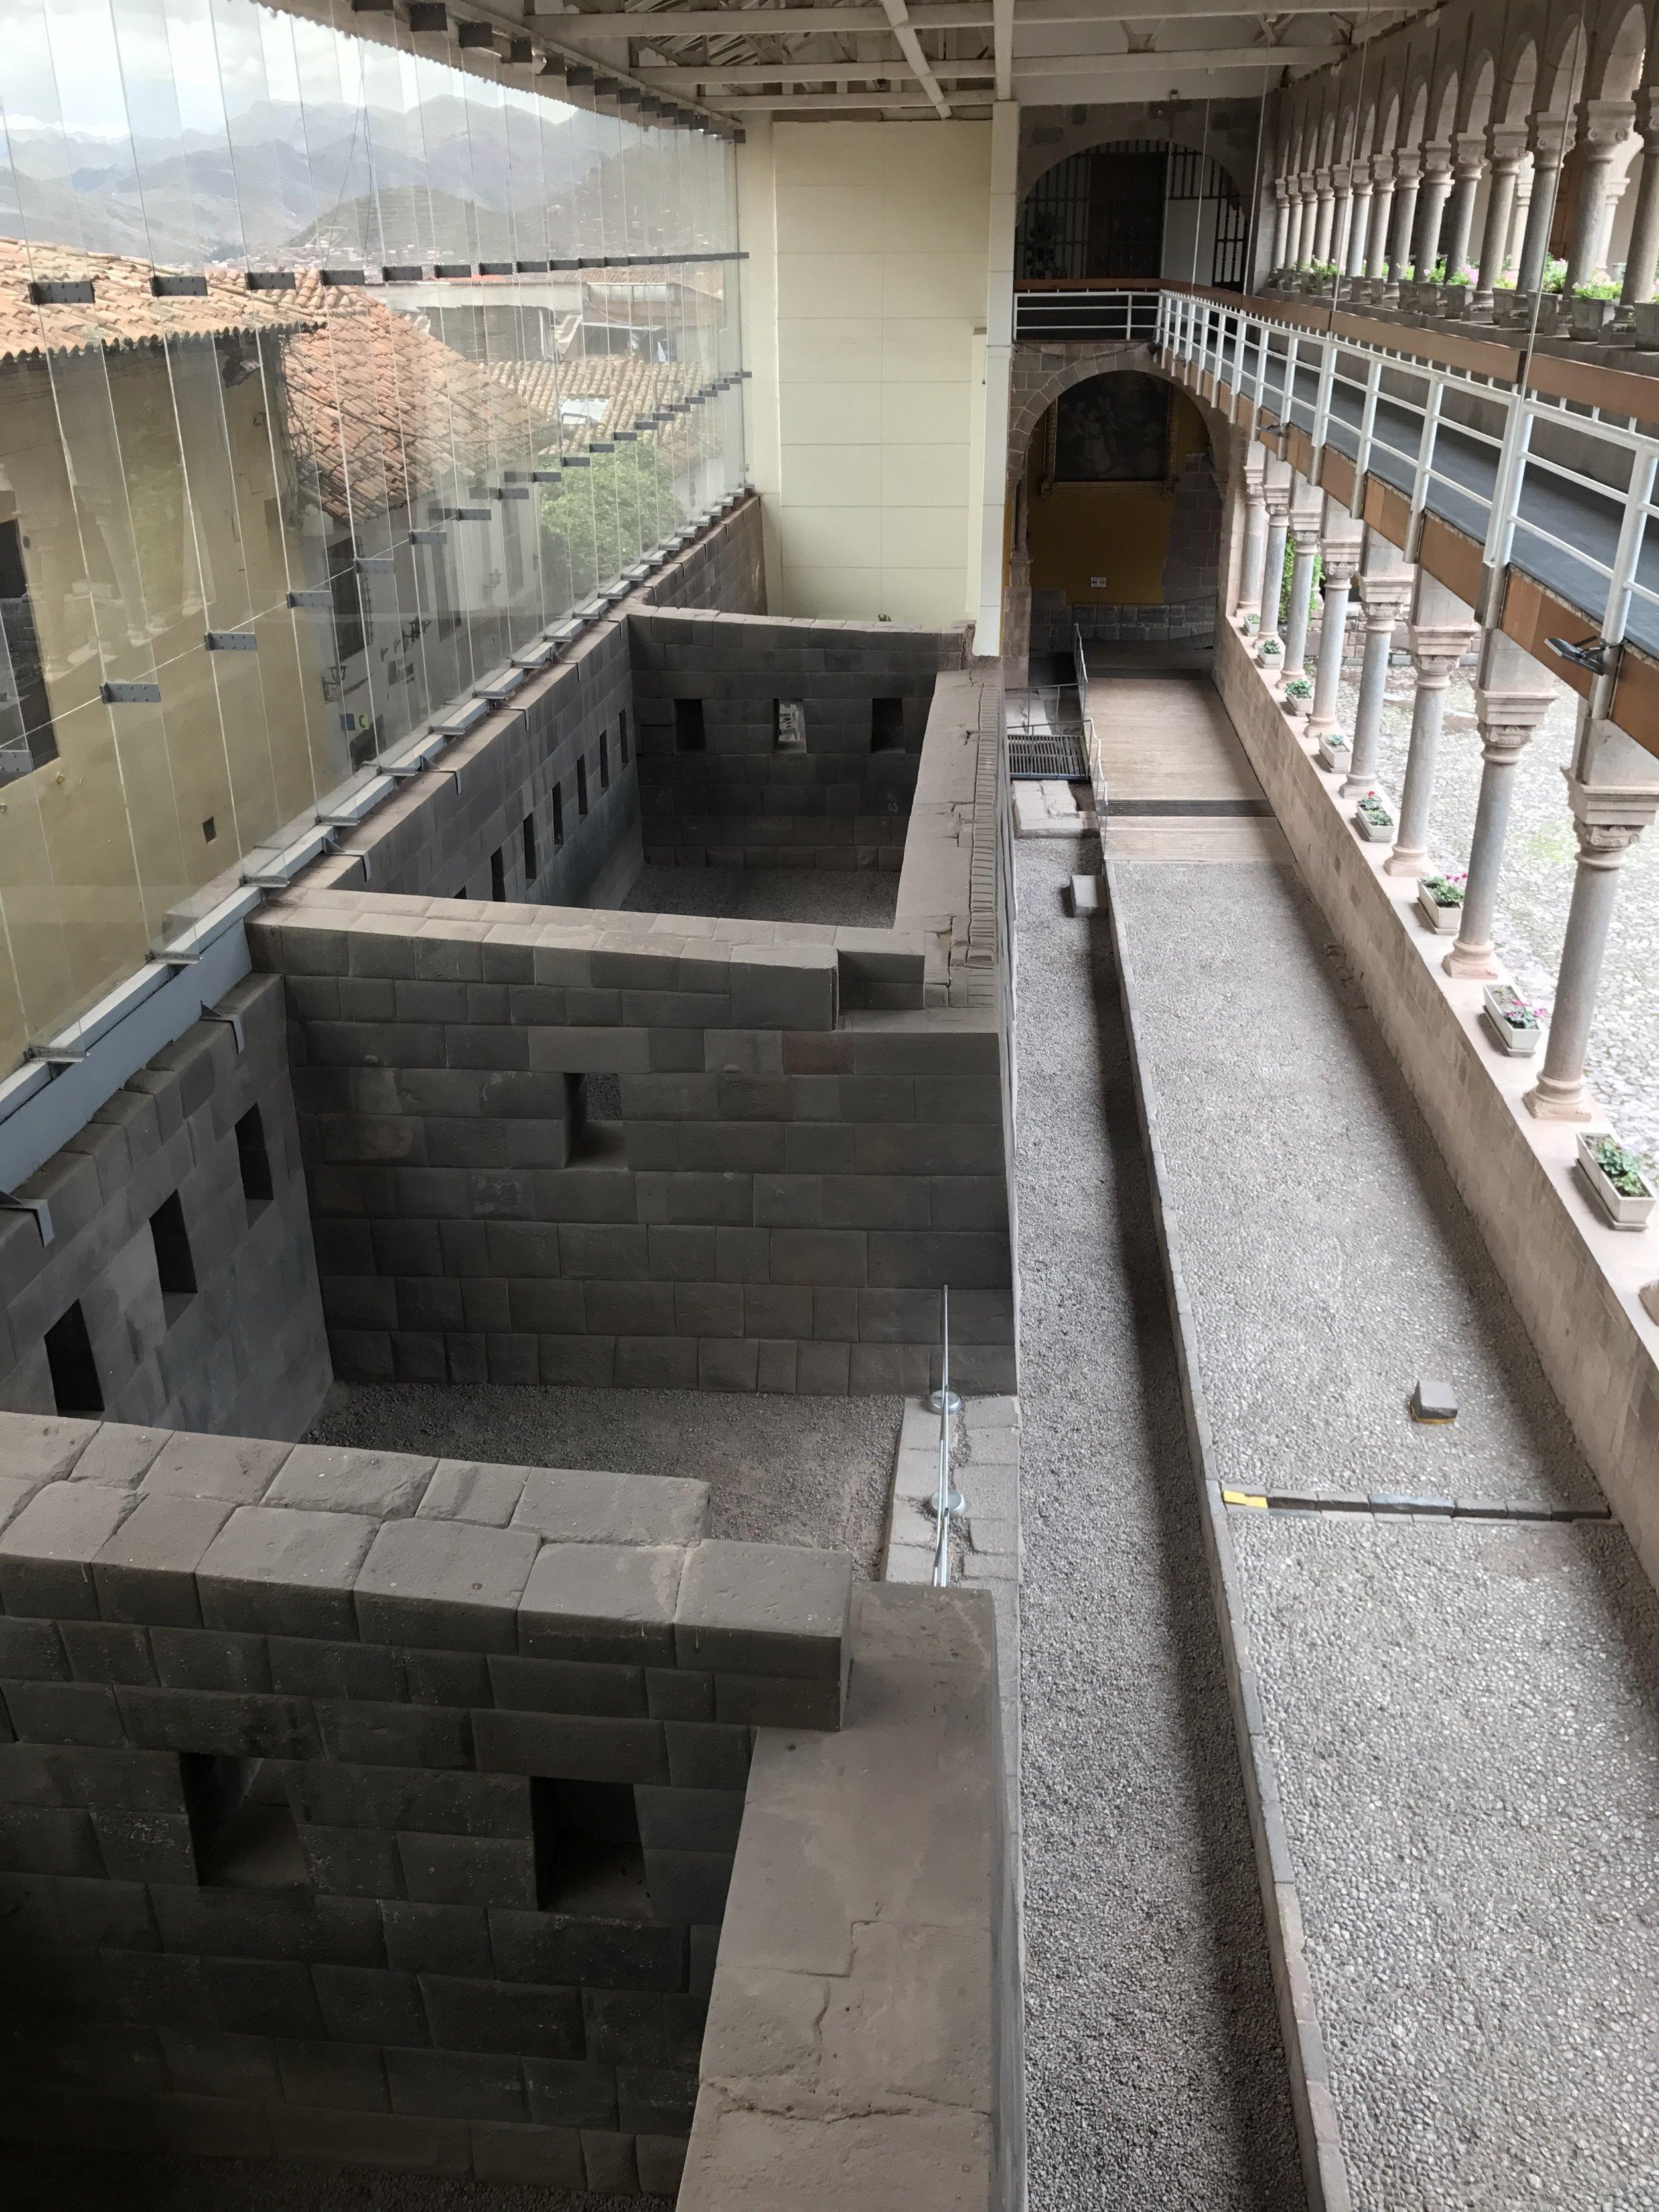 Rooms of the Inca Sun Temple inside the church.